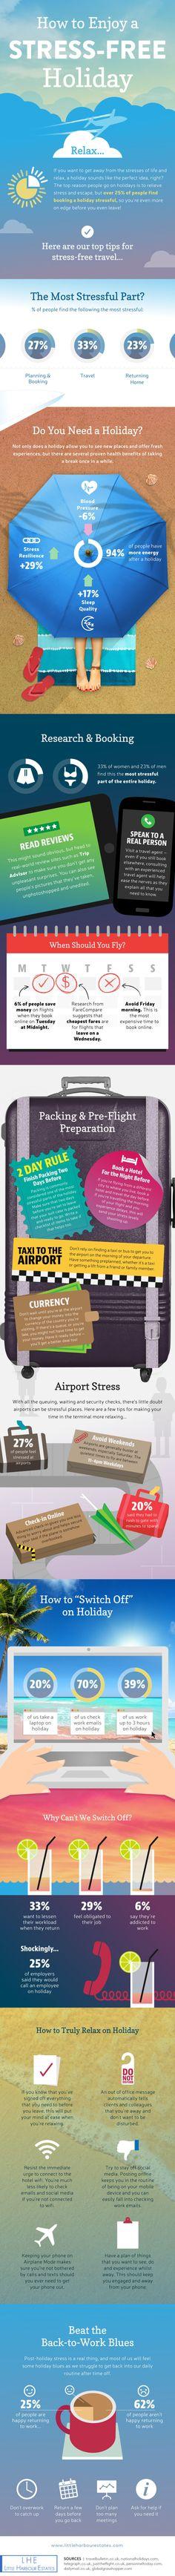 Making Travel Less Stressful